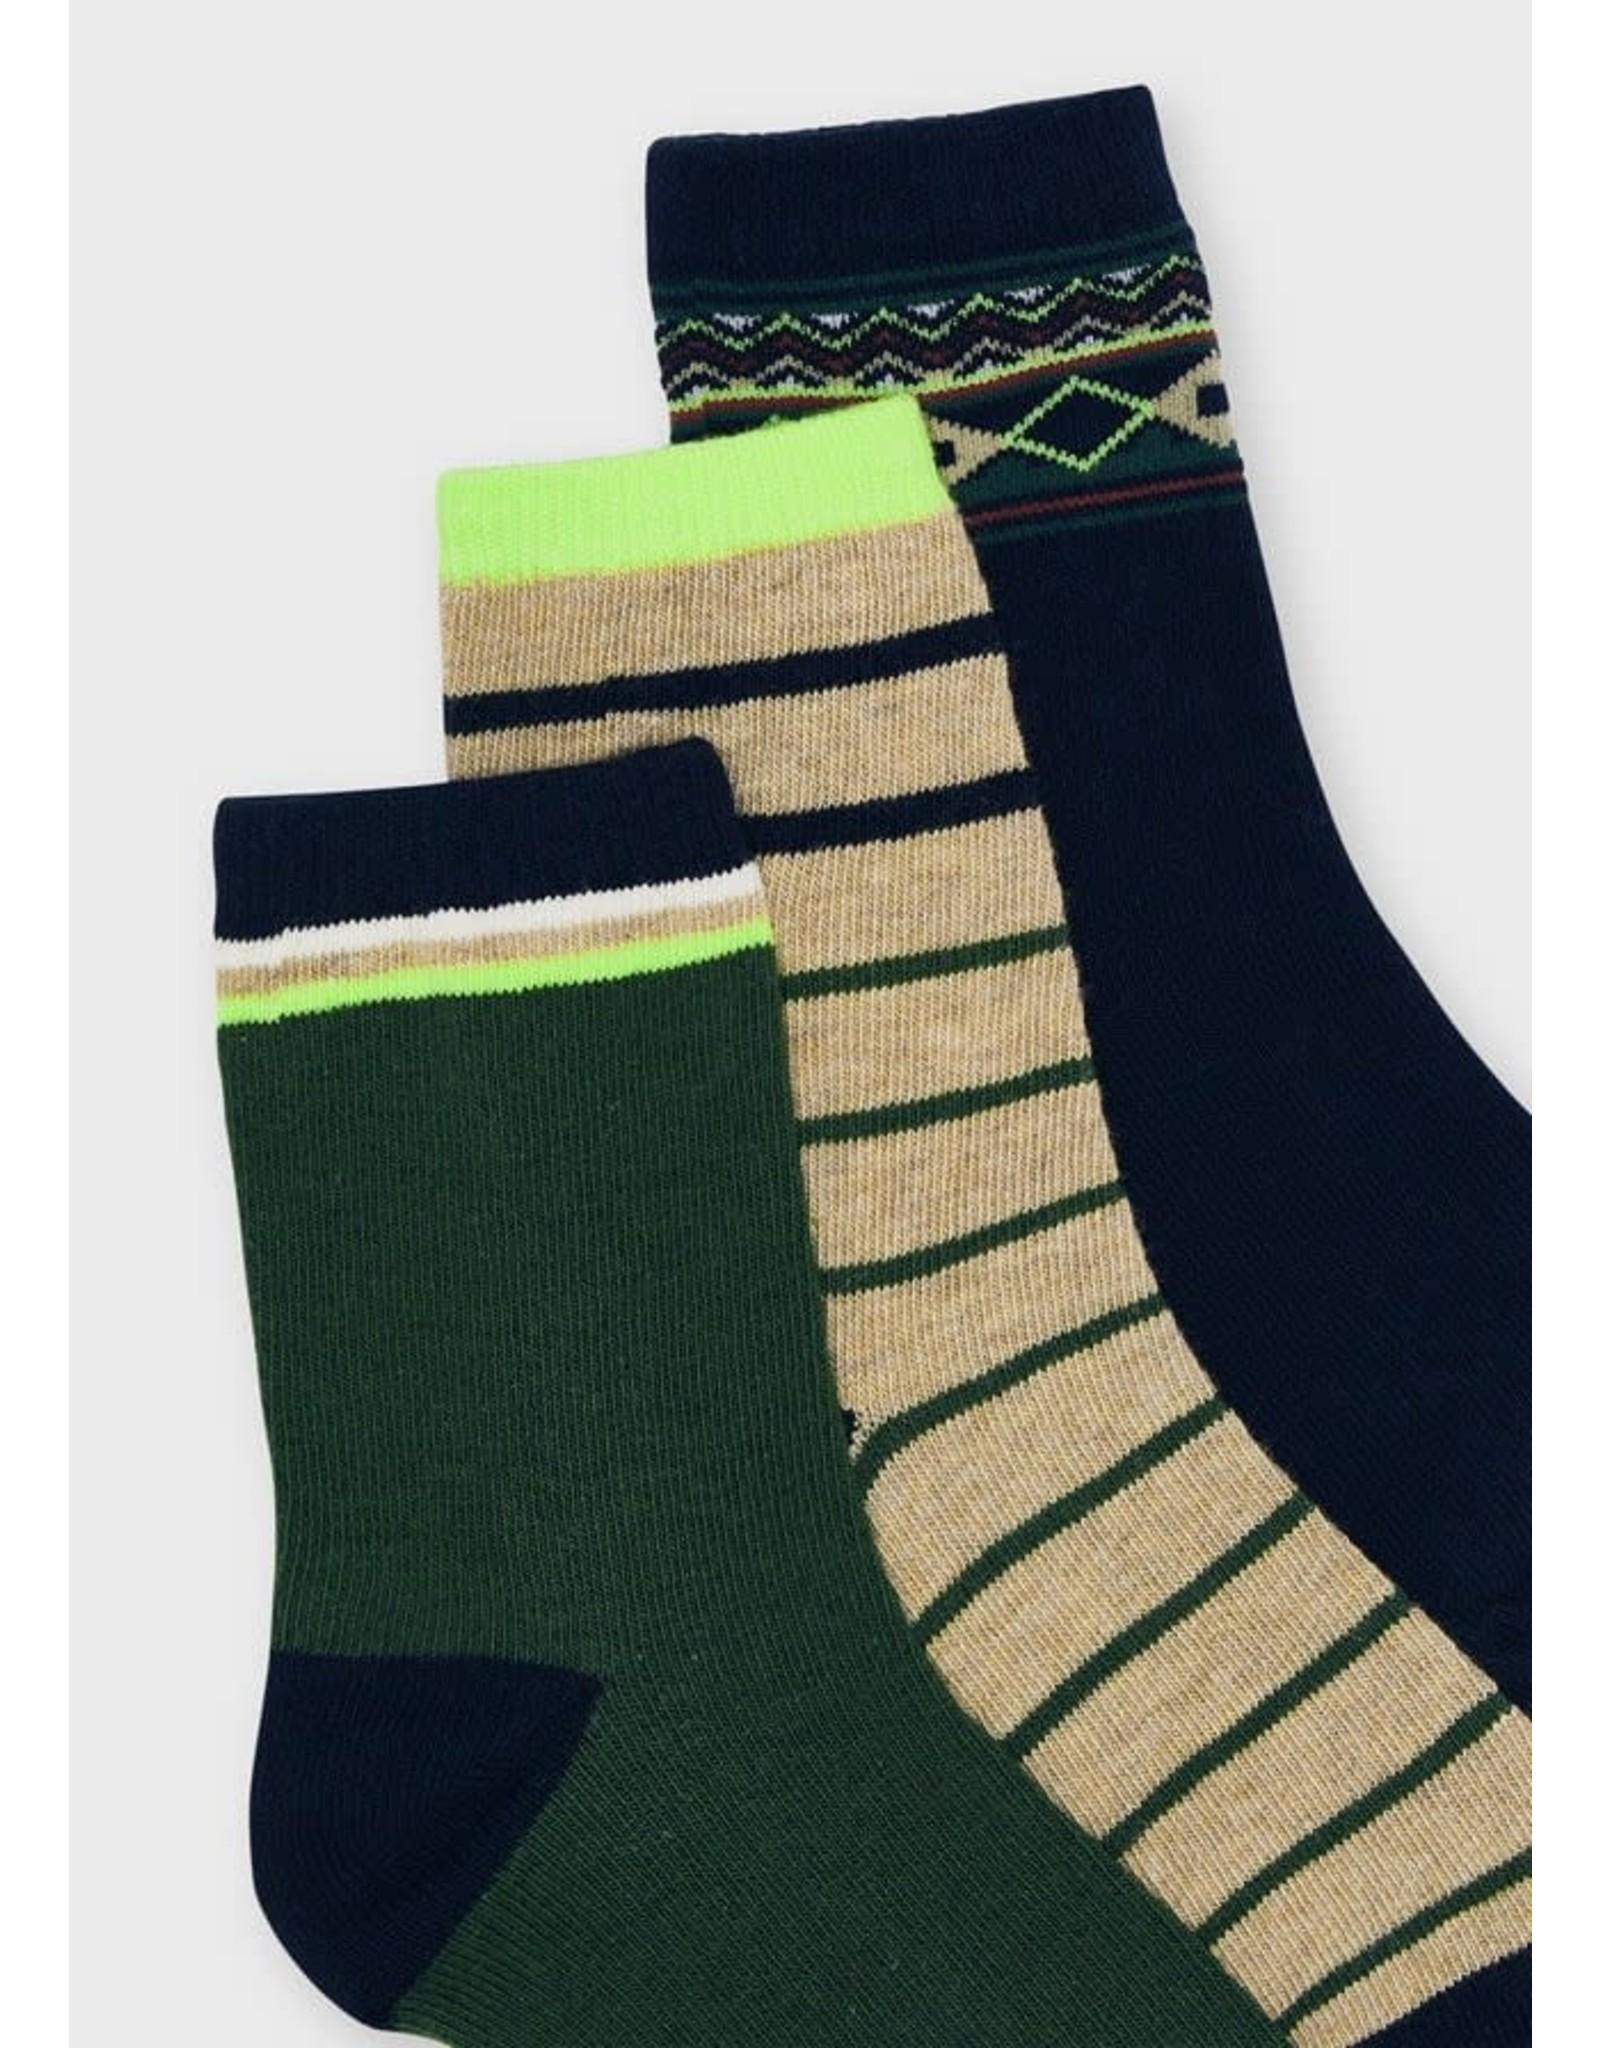 Mayoral Kale Socks Set (3 pairs)